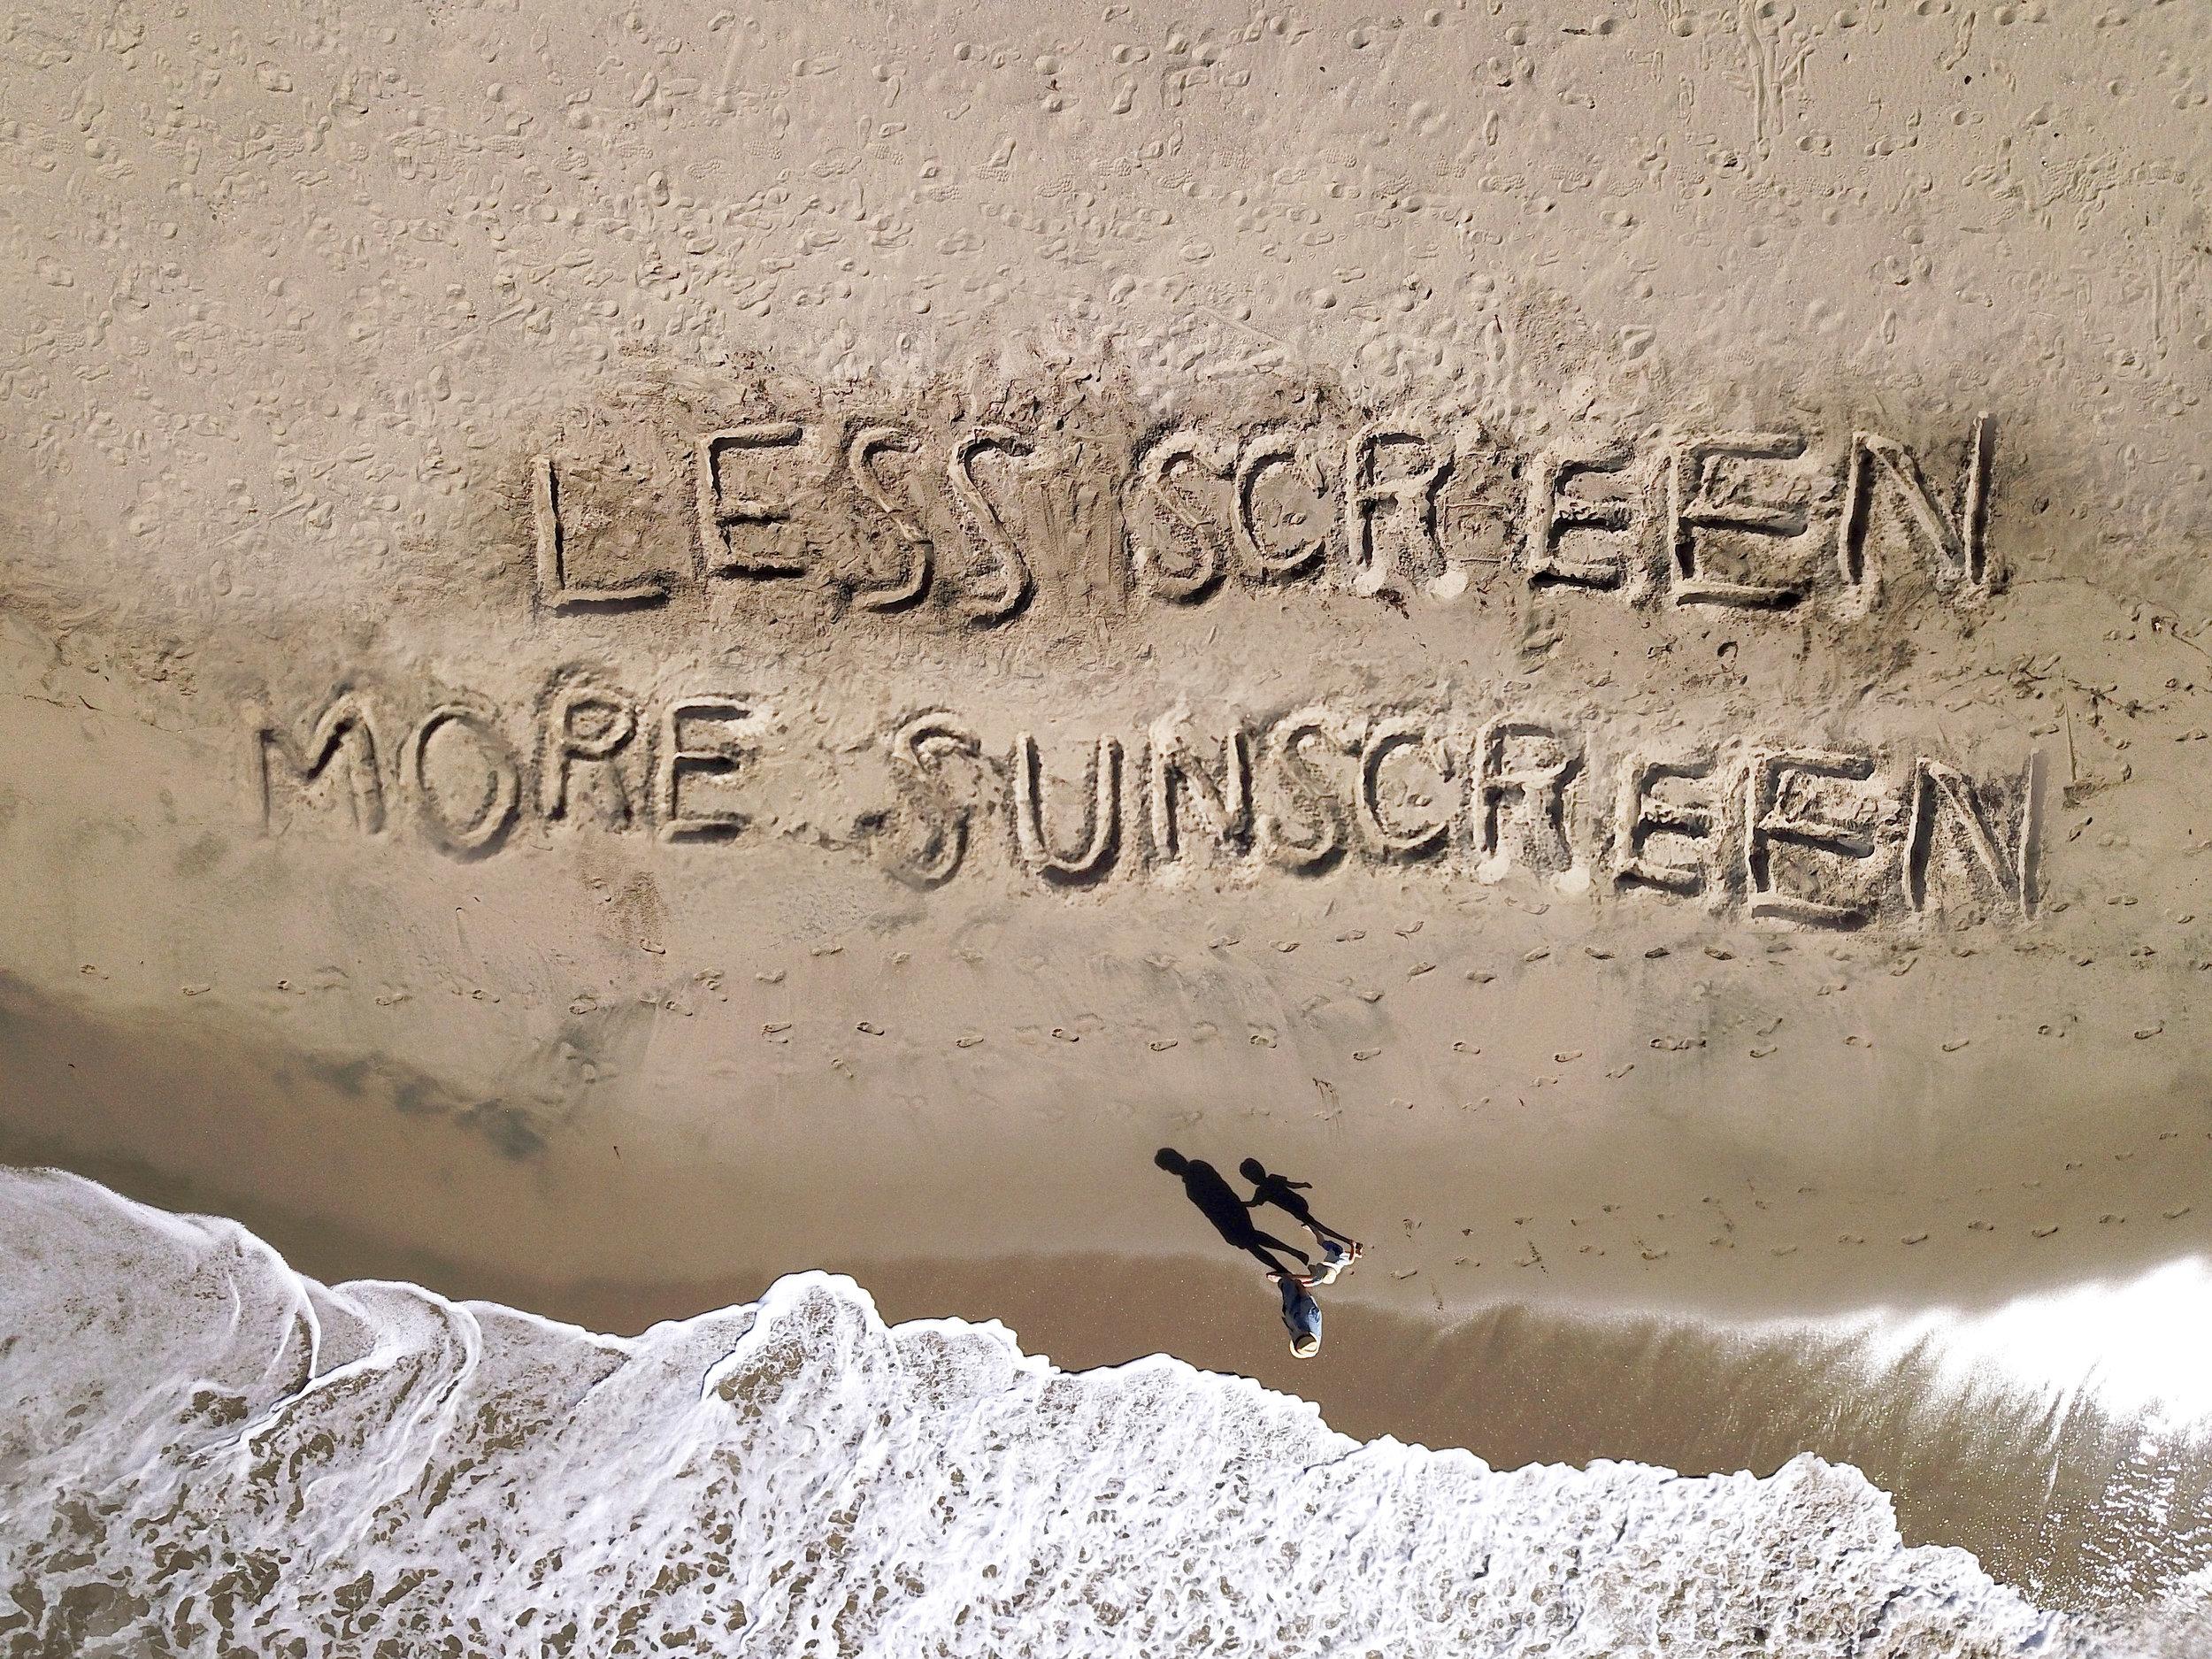 BeachWisdom_LessScreenMoreSunscreen 01C.jpg